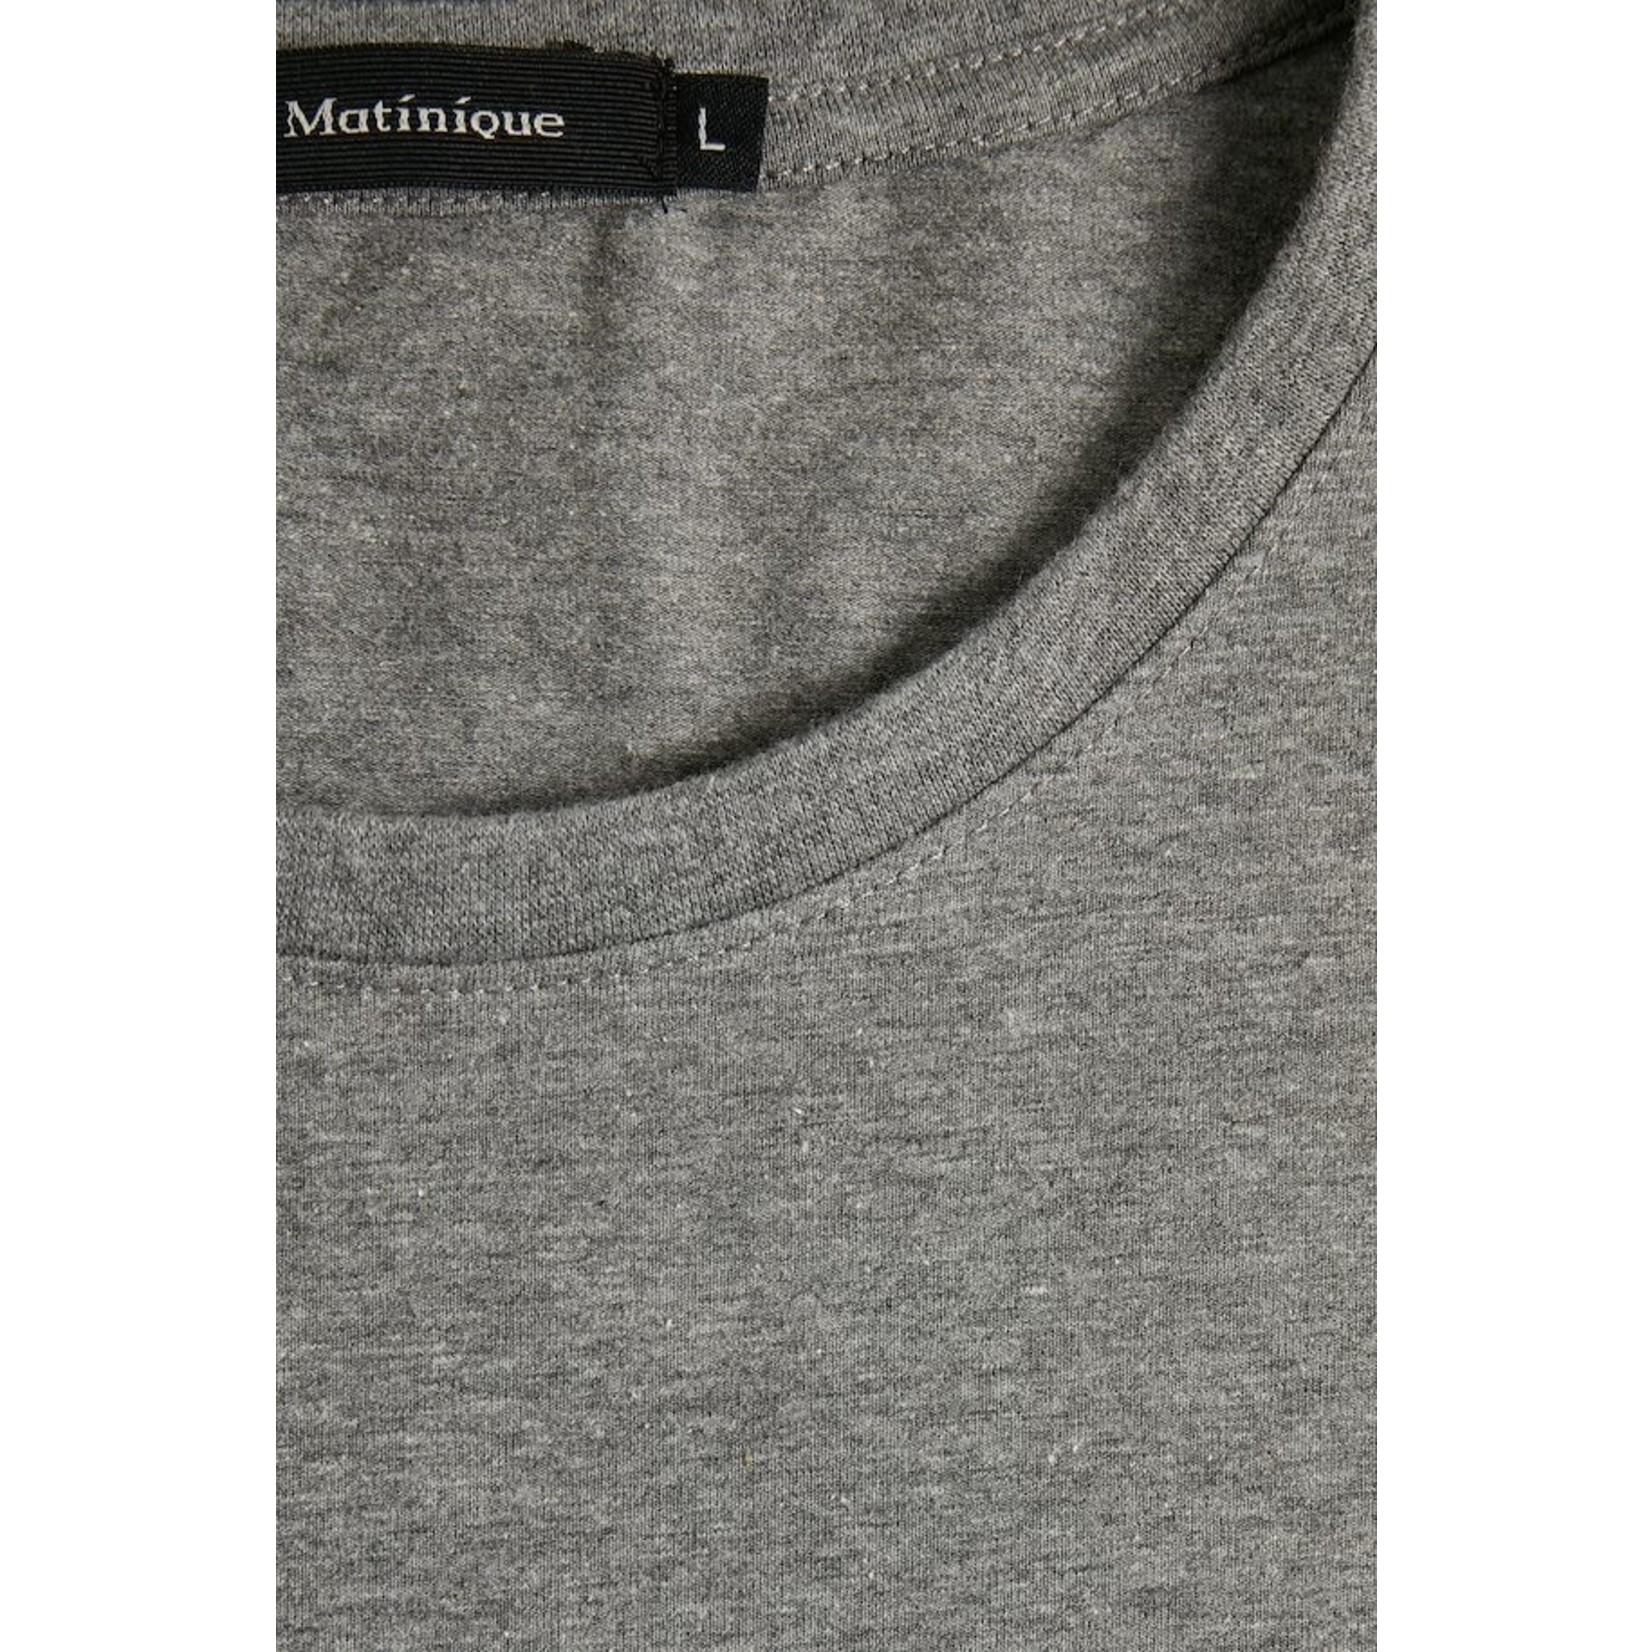 Matinique Matinique Jermalink Crewneck Tee - Med. Grey